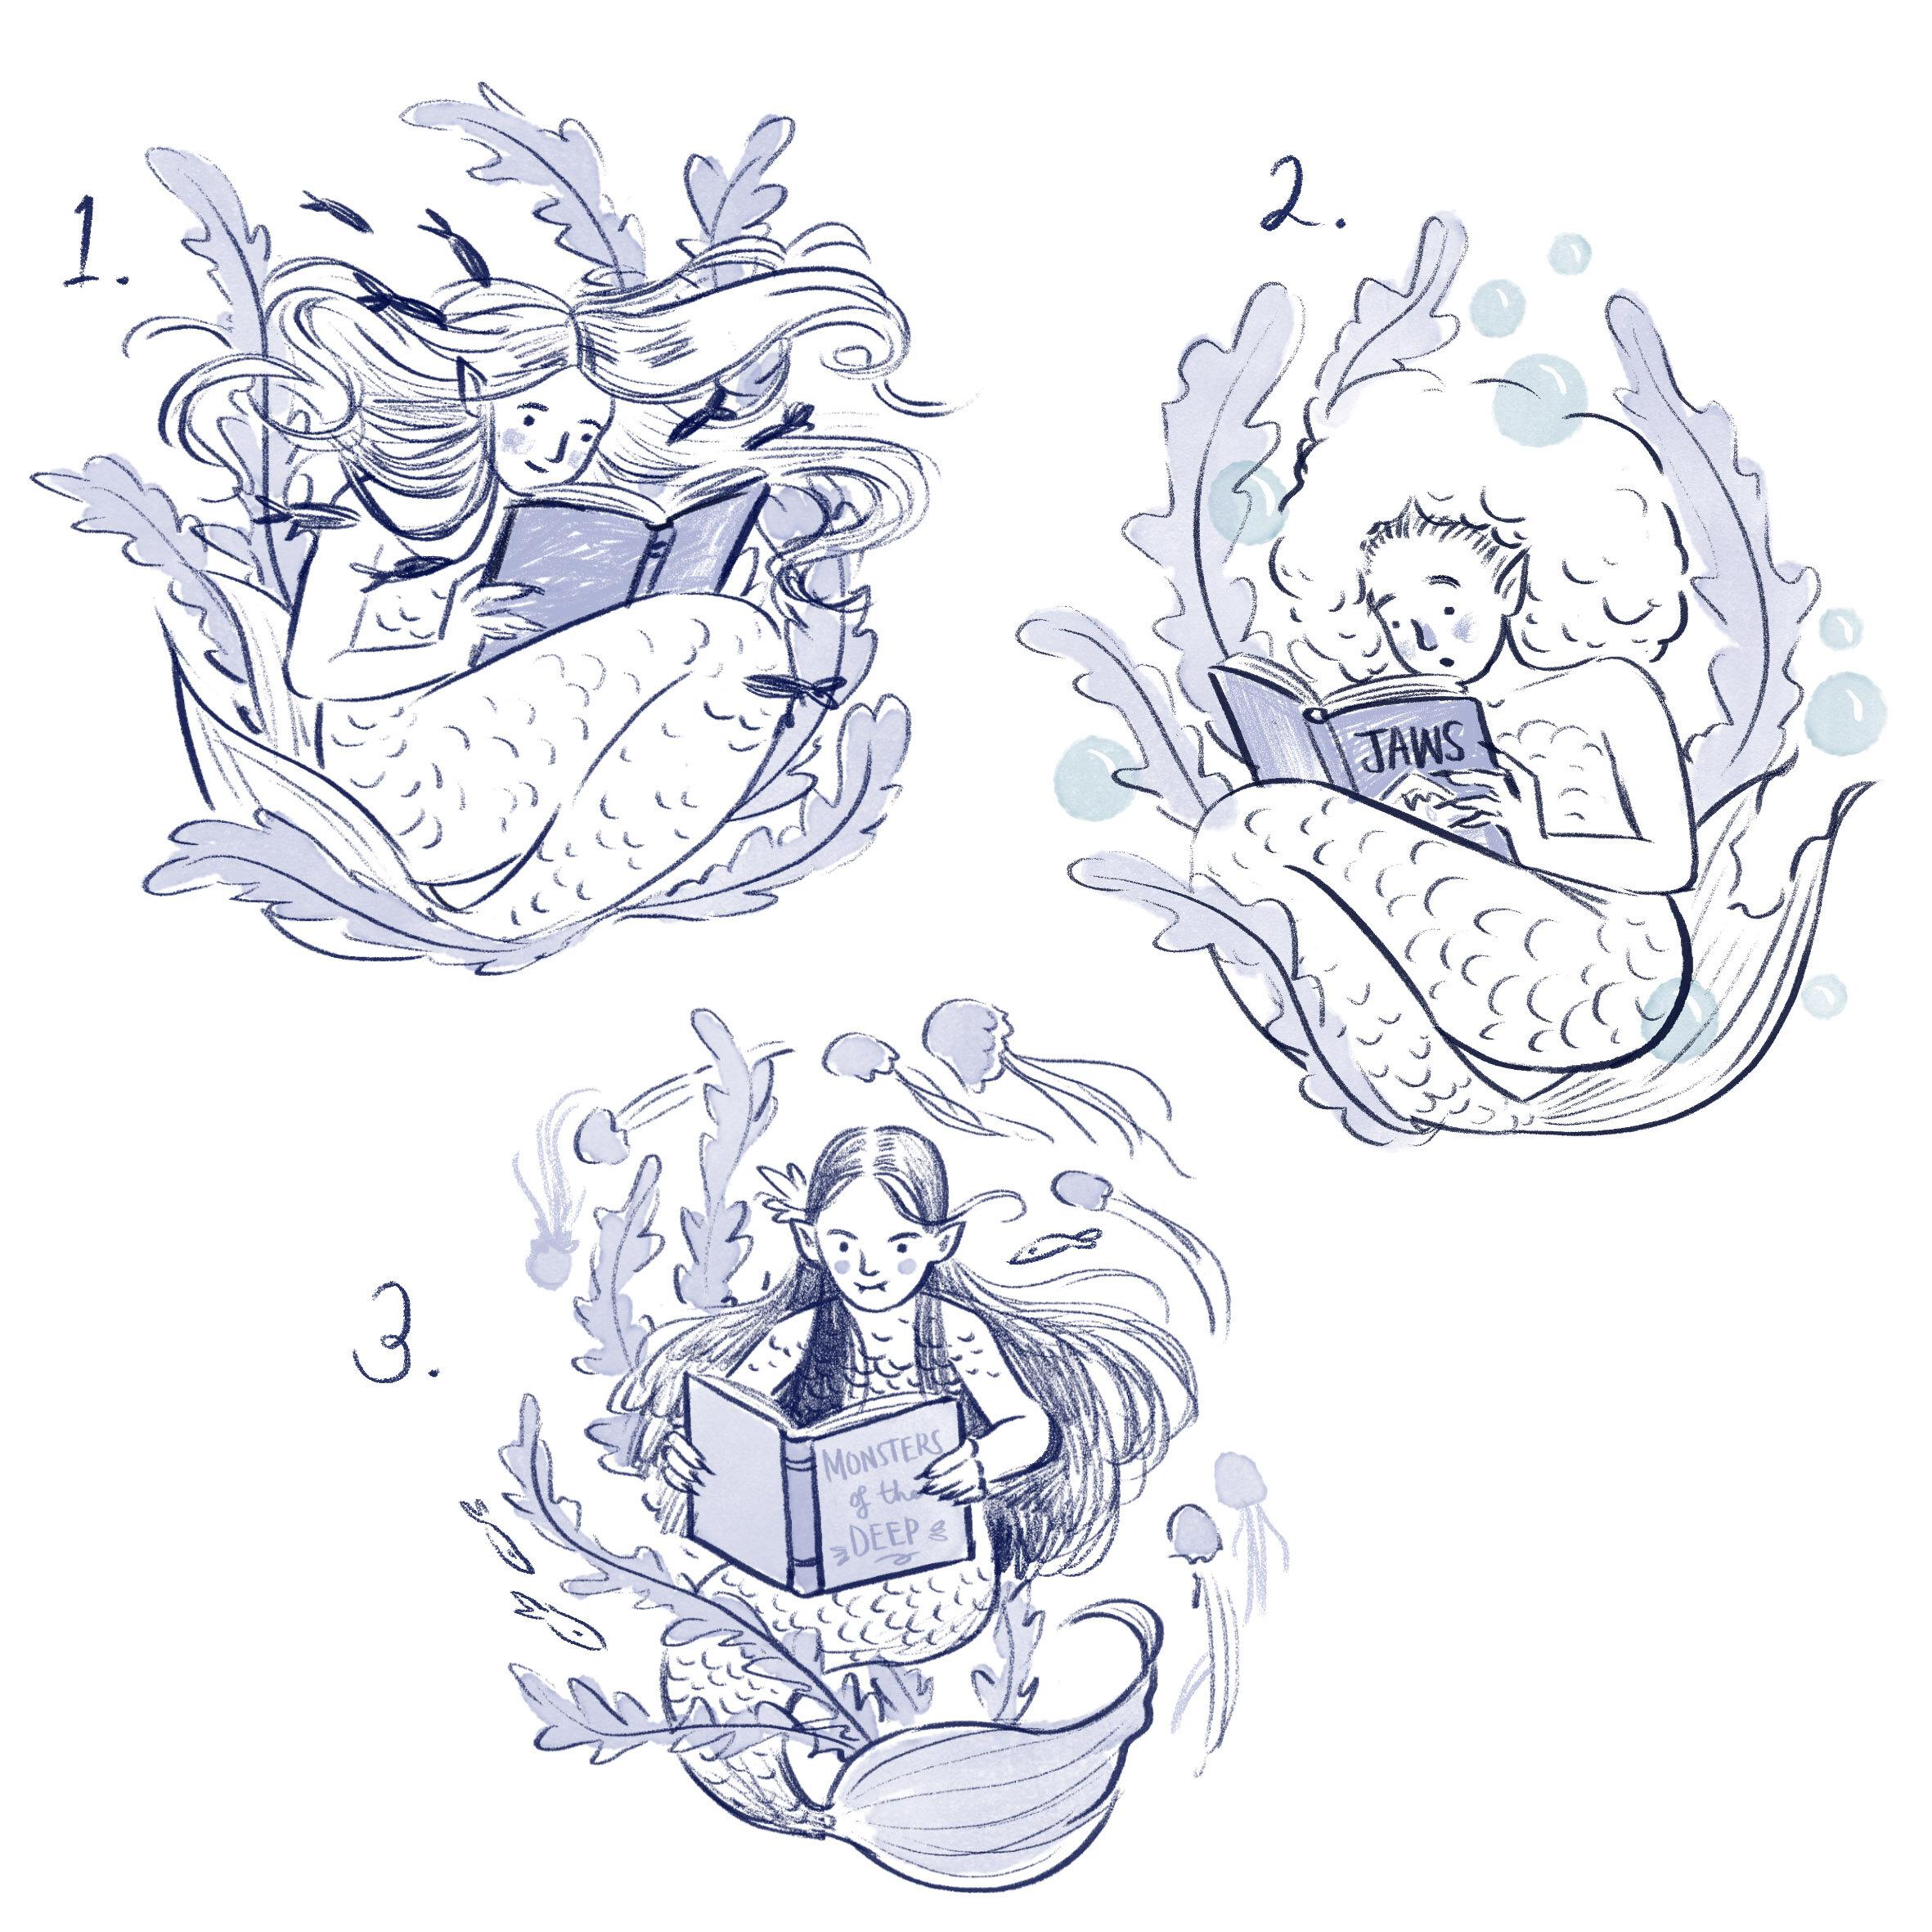 OwlC-Sketches.jpg